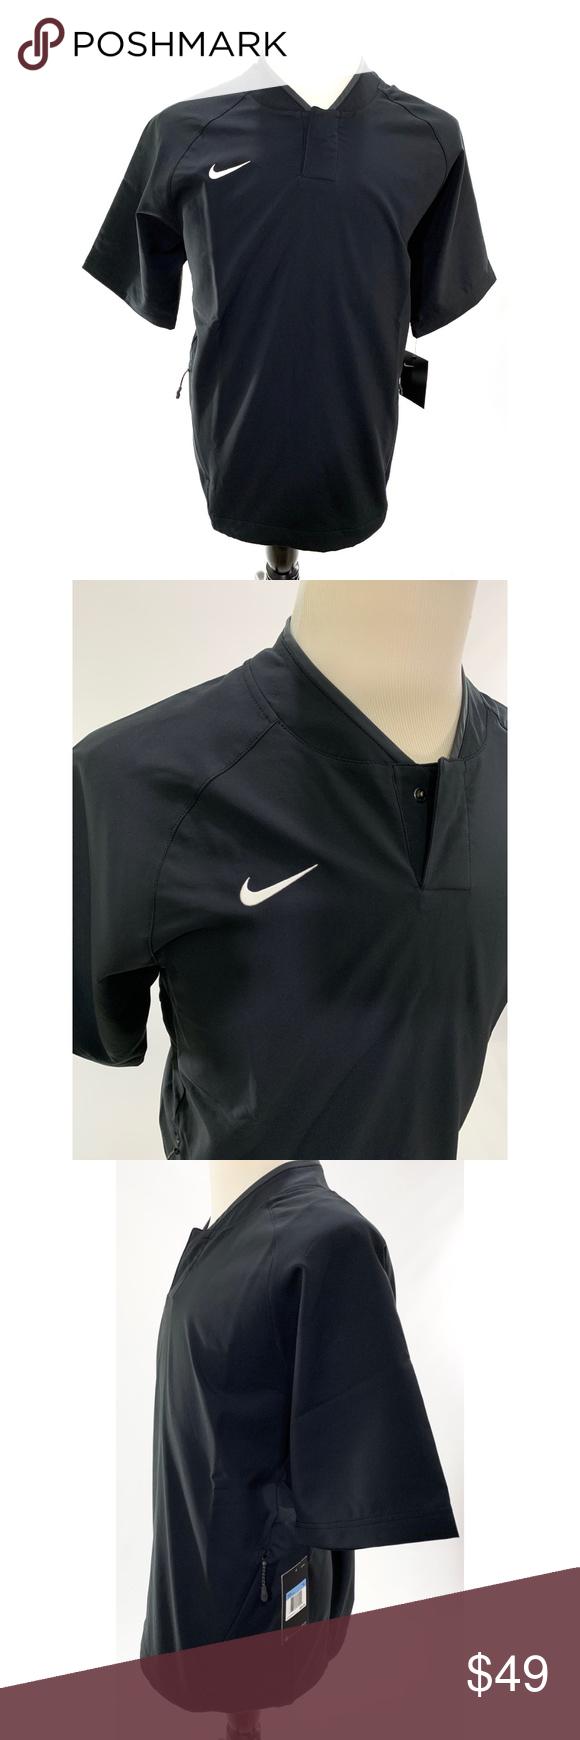 Nike Men S Baseball Coaches Batting Cage Jacket Nike Men Active Wear Shorts Clothes Design [ 1740 x 580 Pixel ]